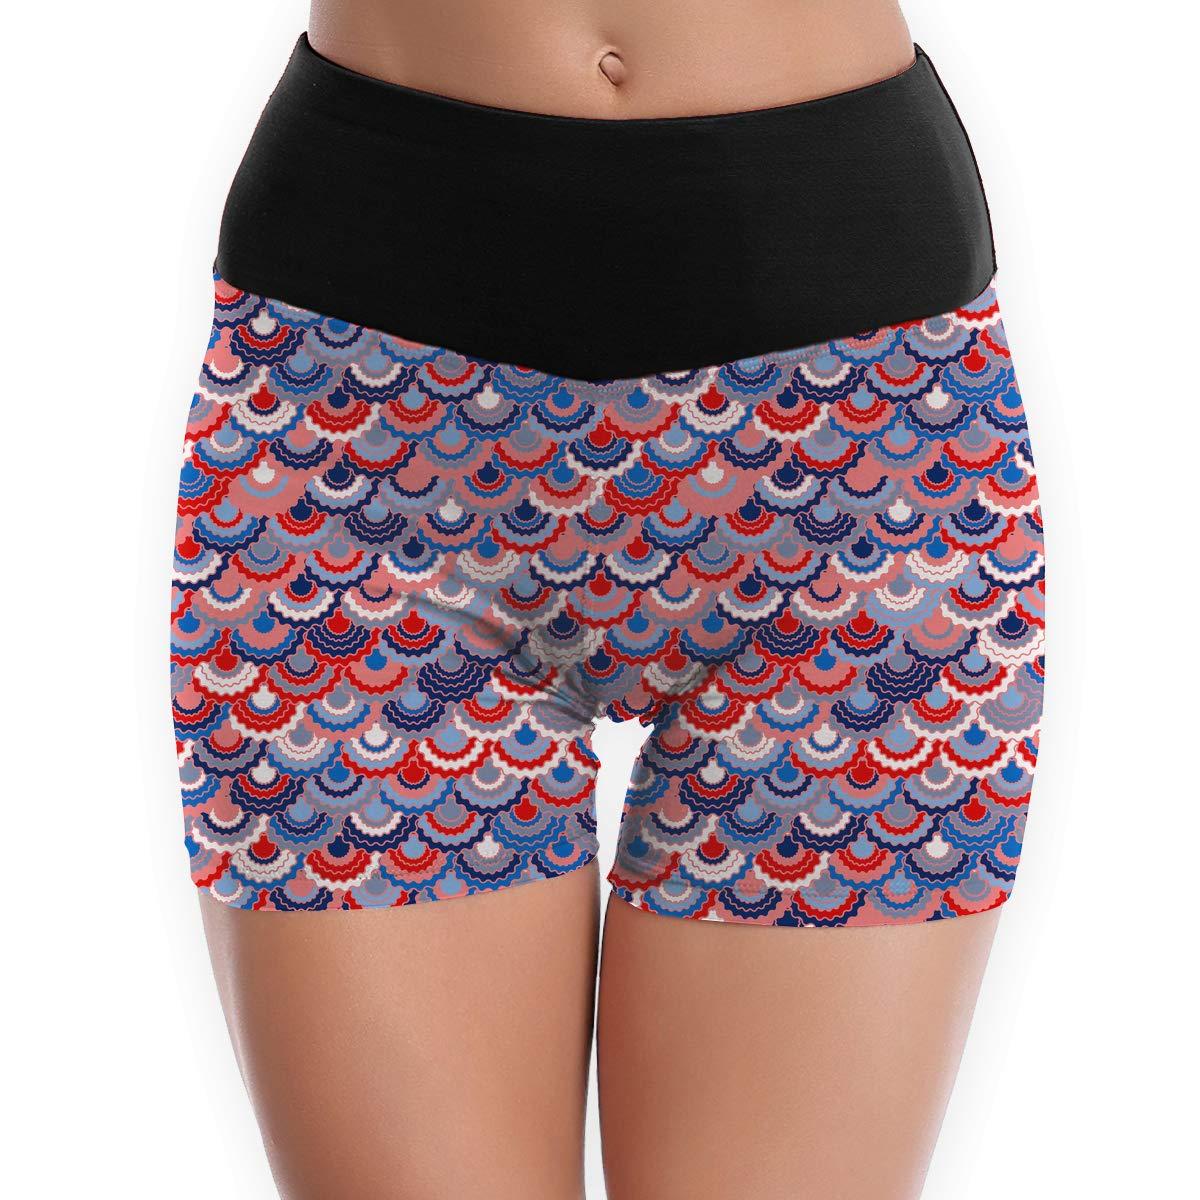 LDGT@DU Womens Yoga Shorts American Flag Ribbons Pattern Athletic Training Shorts